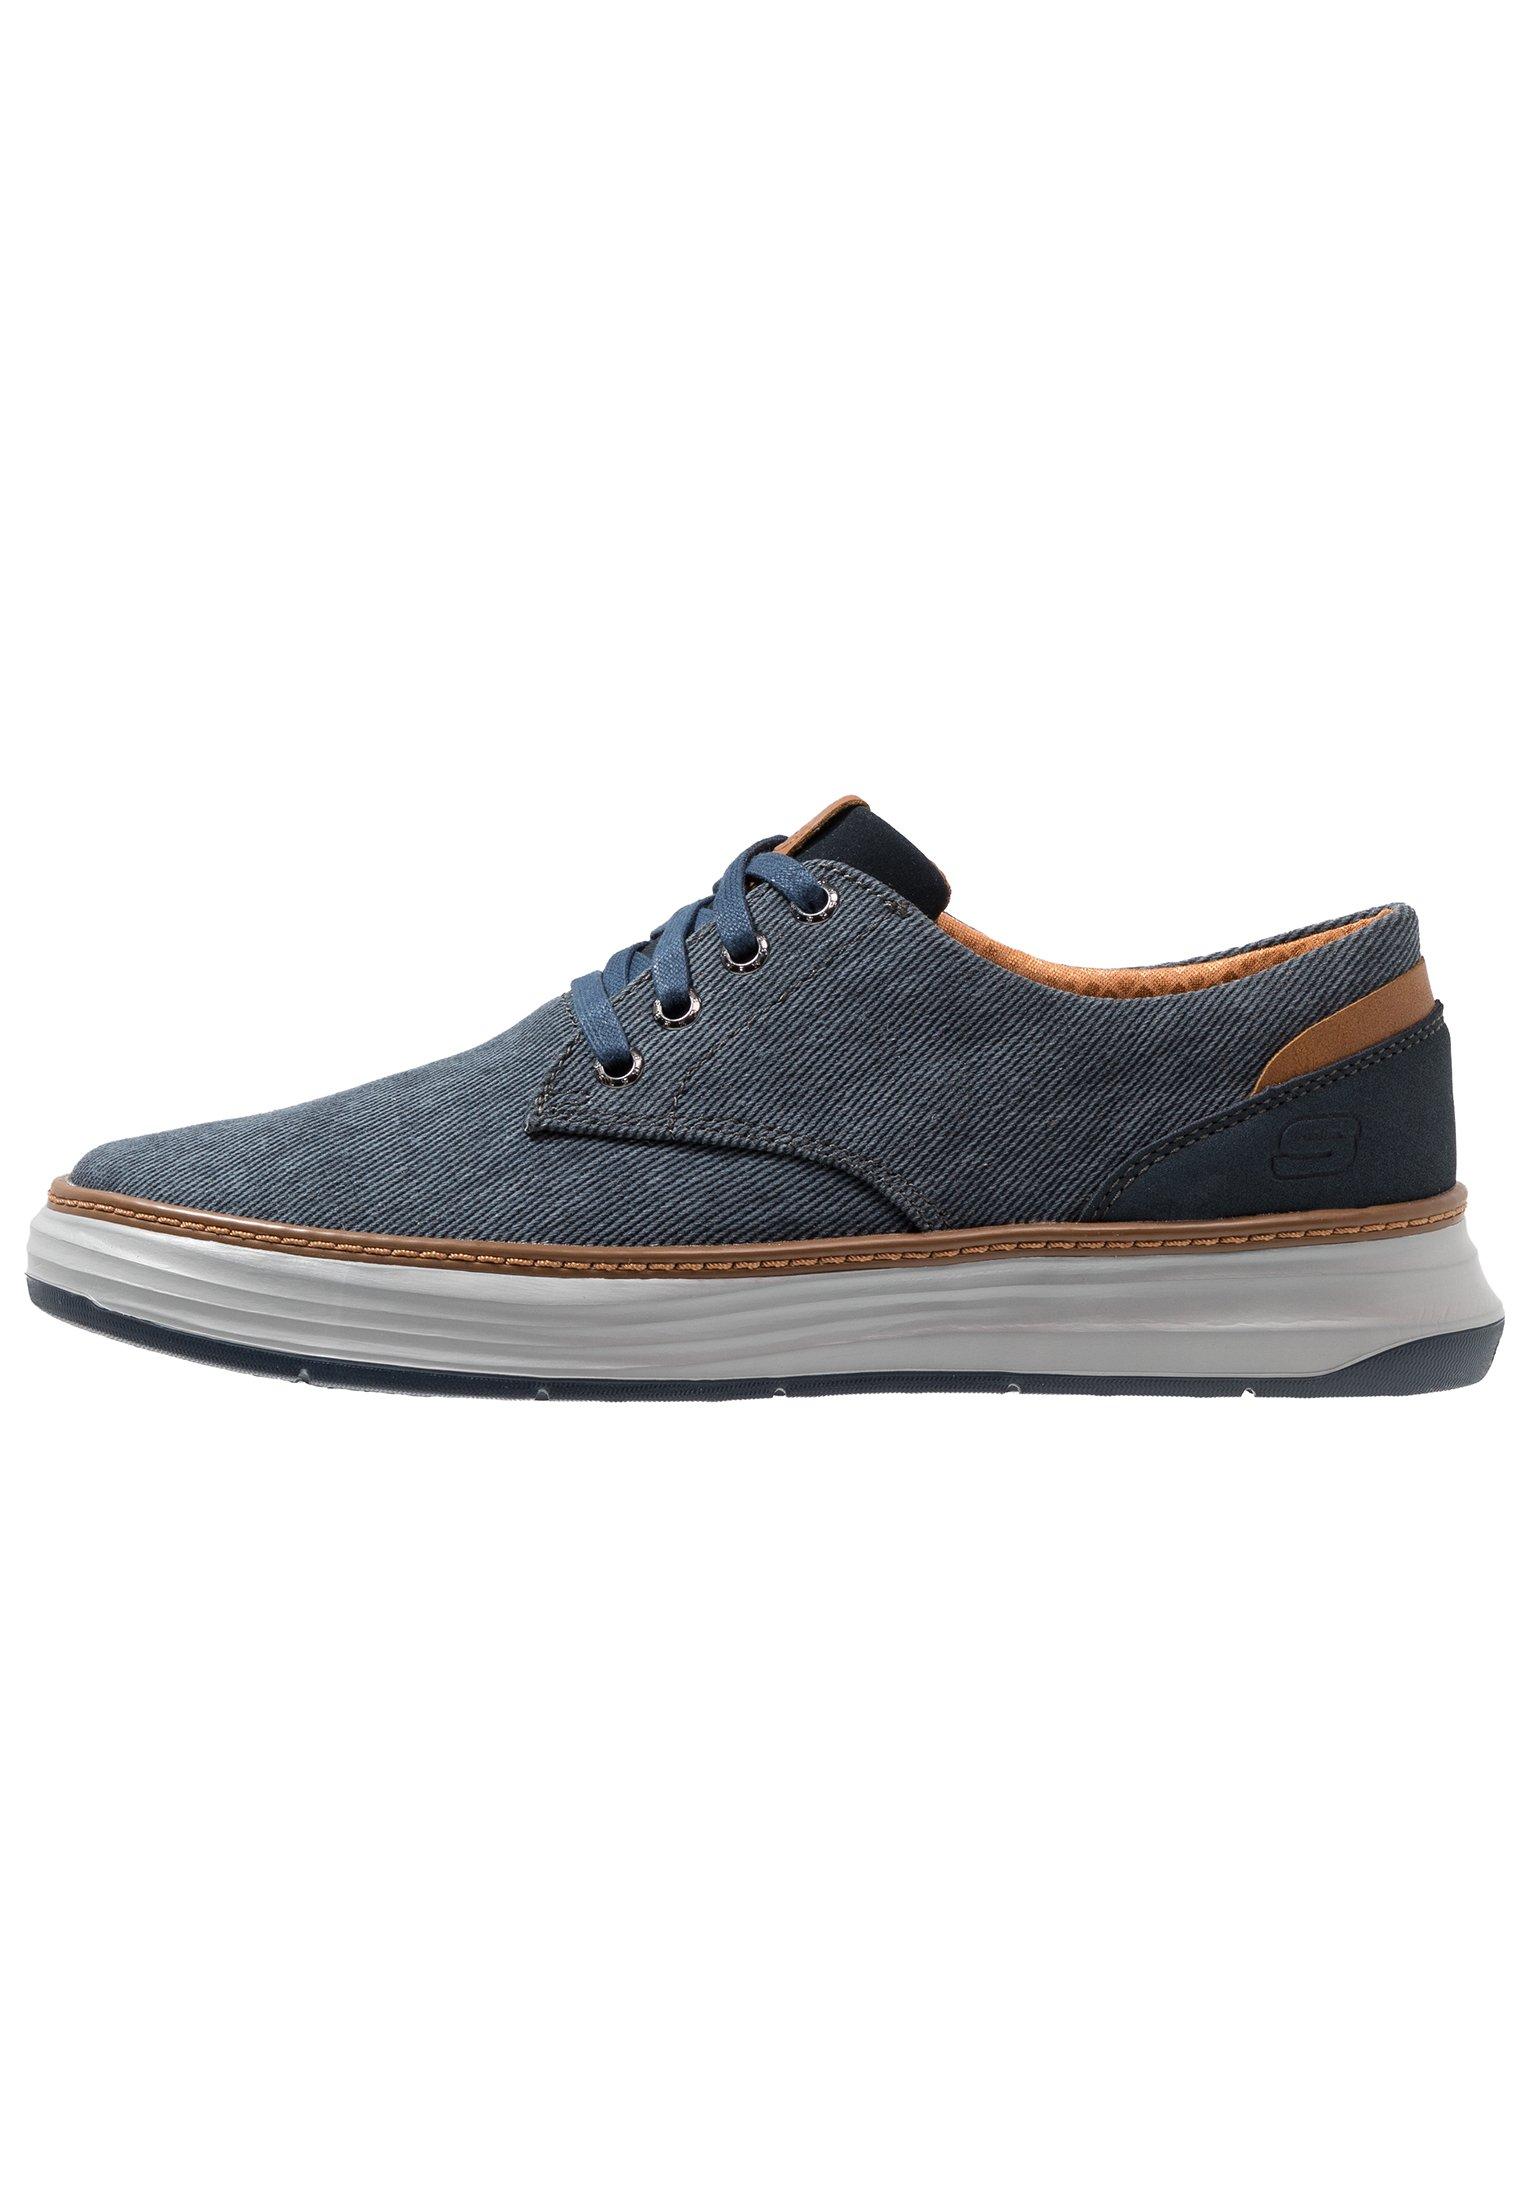 MORENO Sneakers basse navy